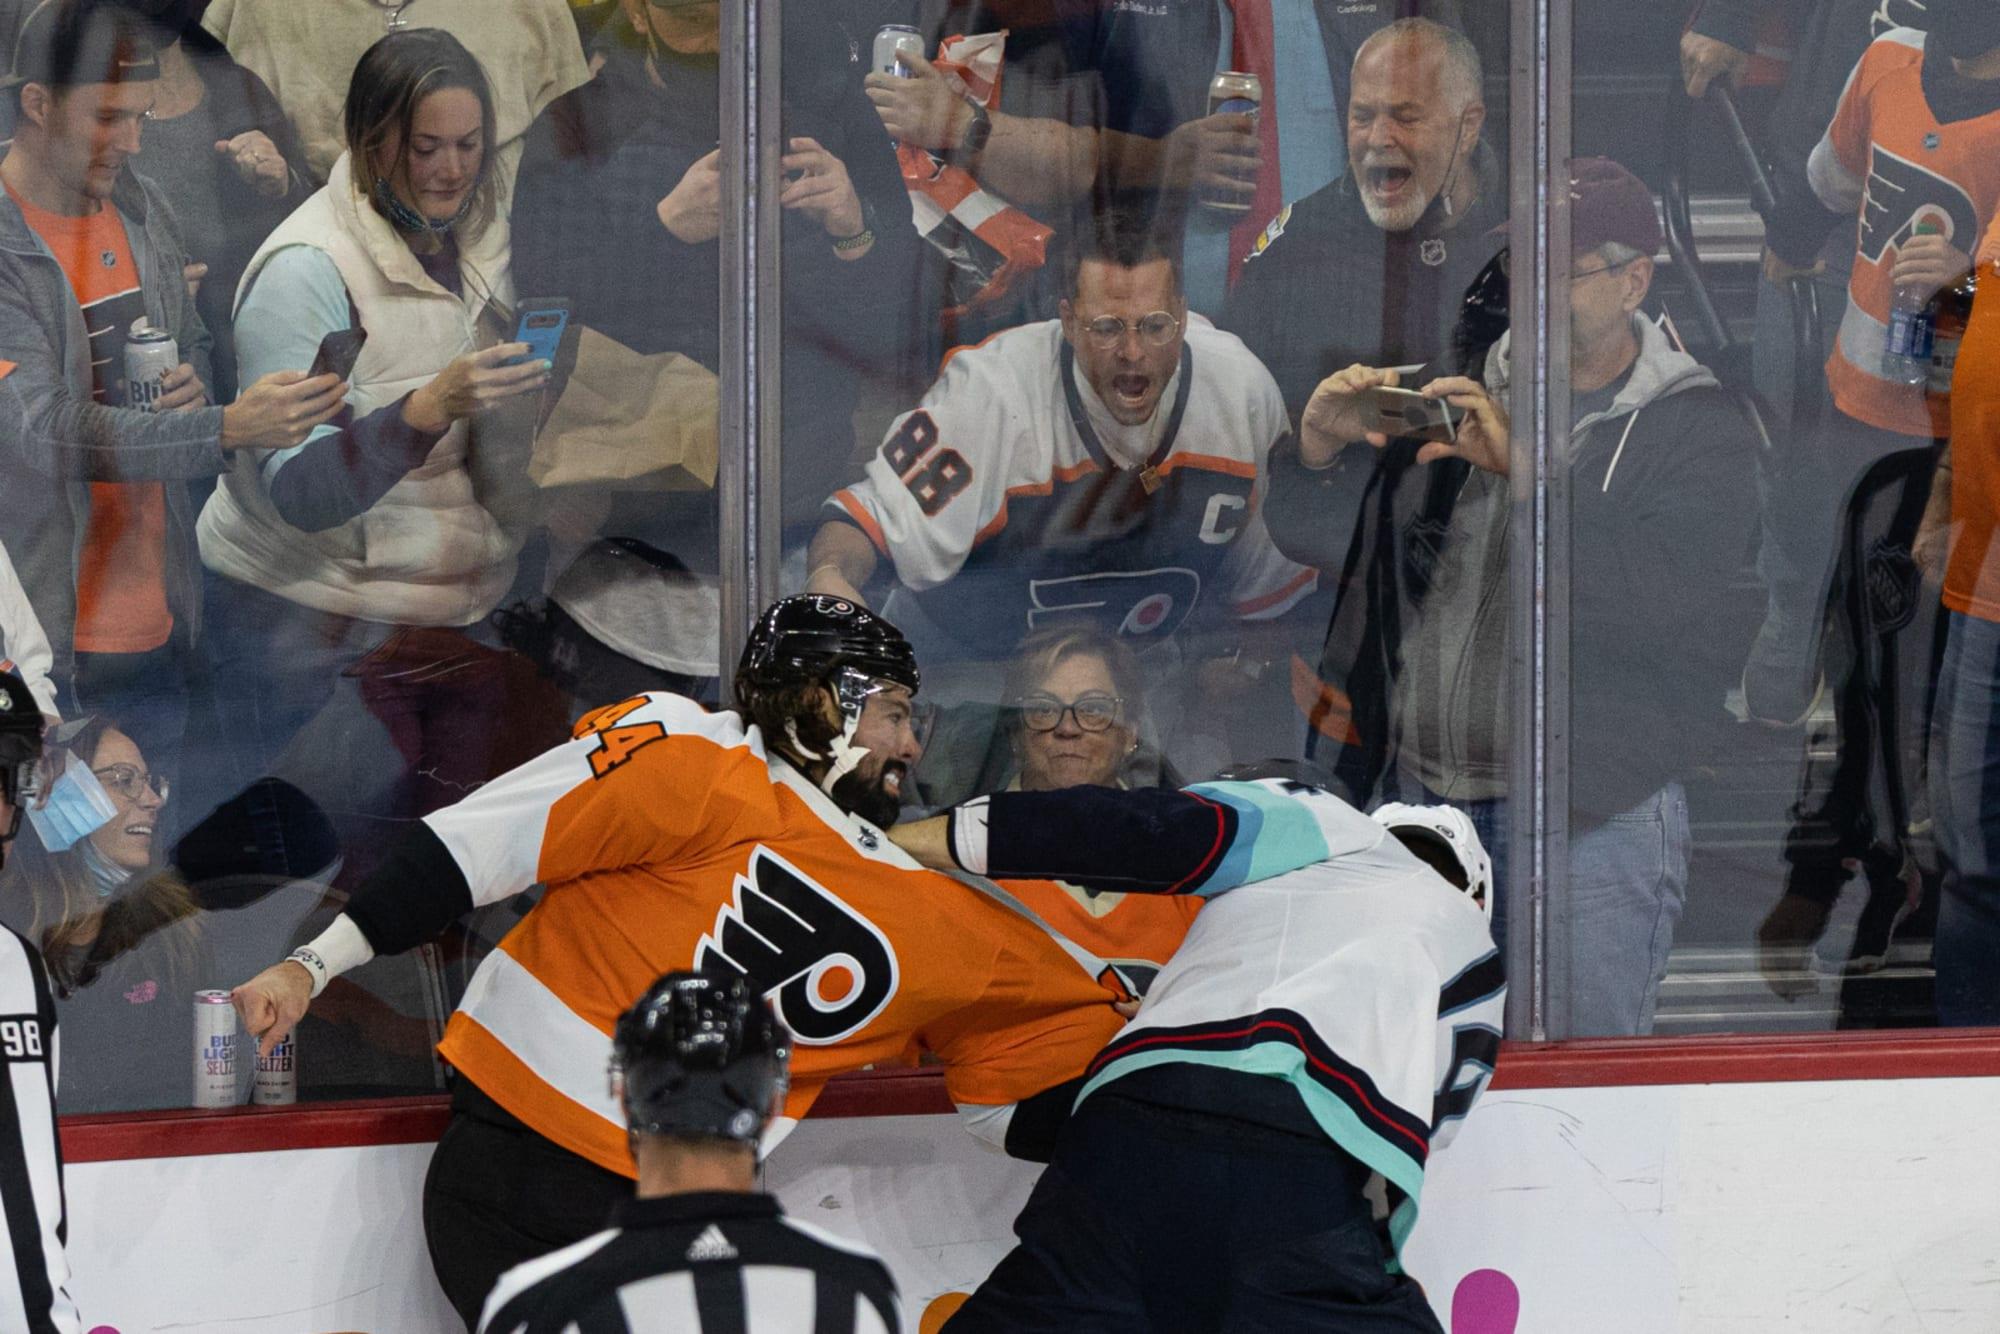 Philadelphia Flyers: Watch Nate Thompson clobber Nate Bastian (video)